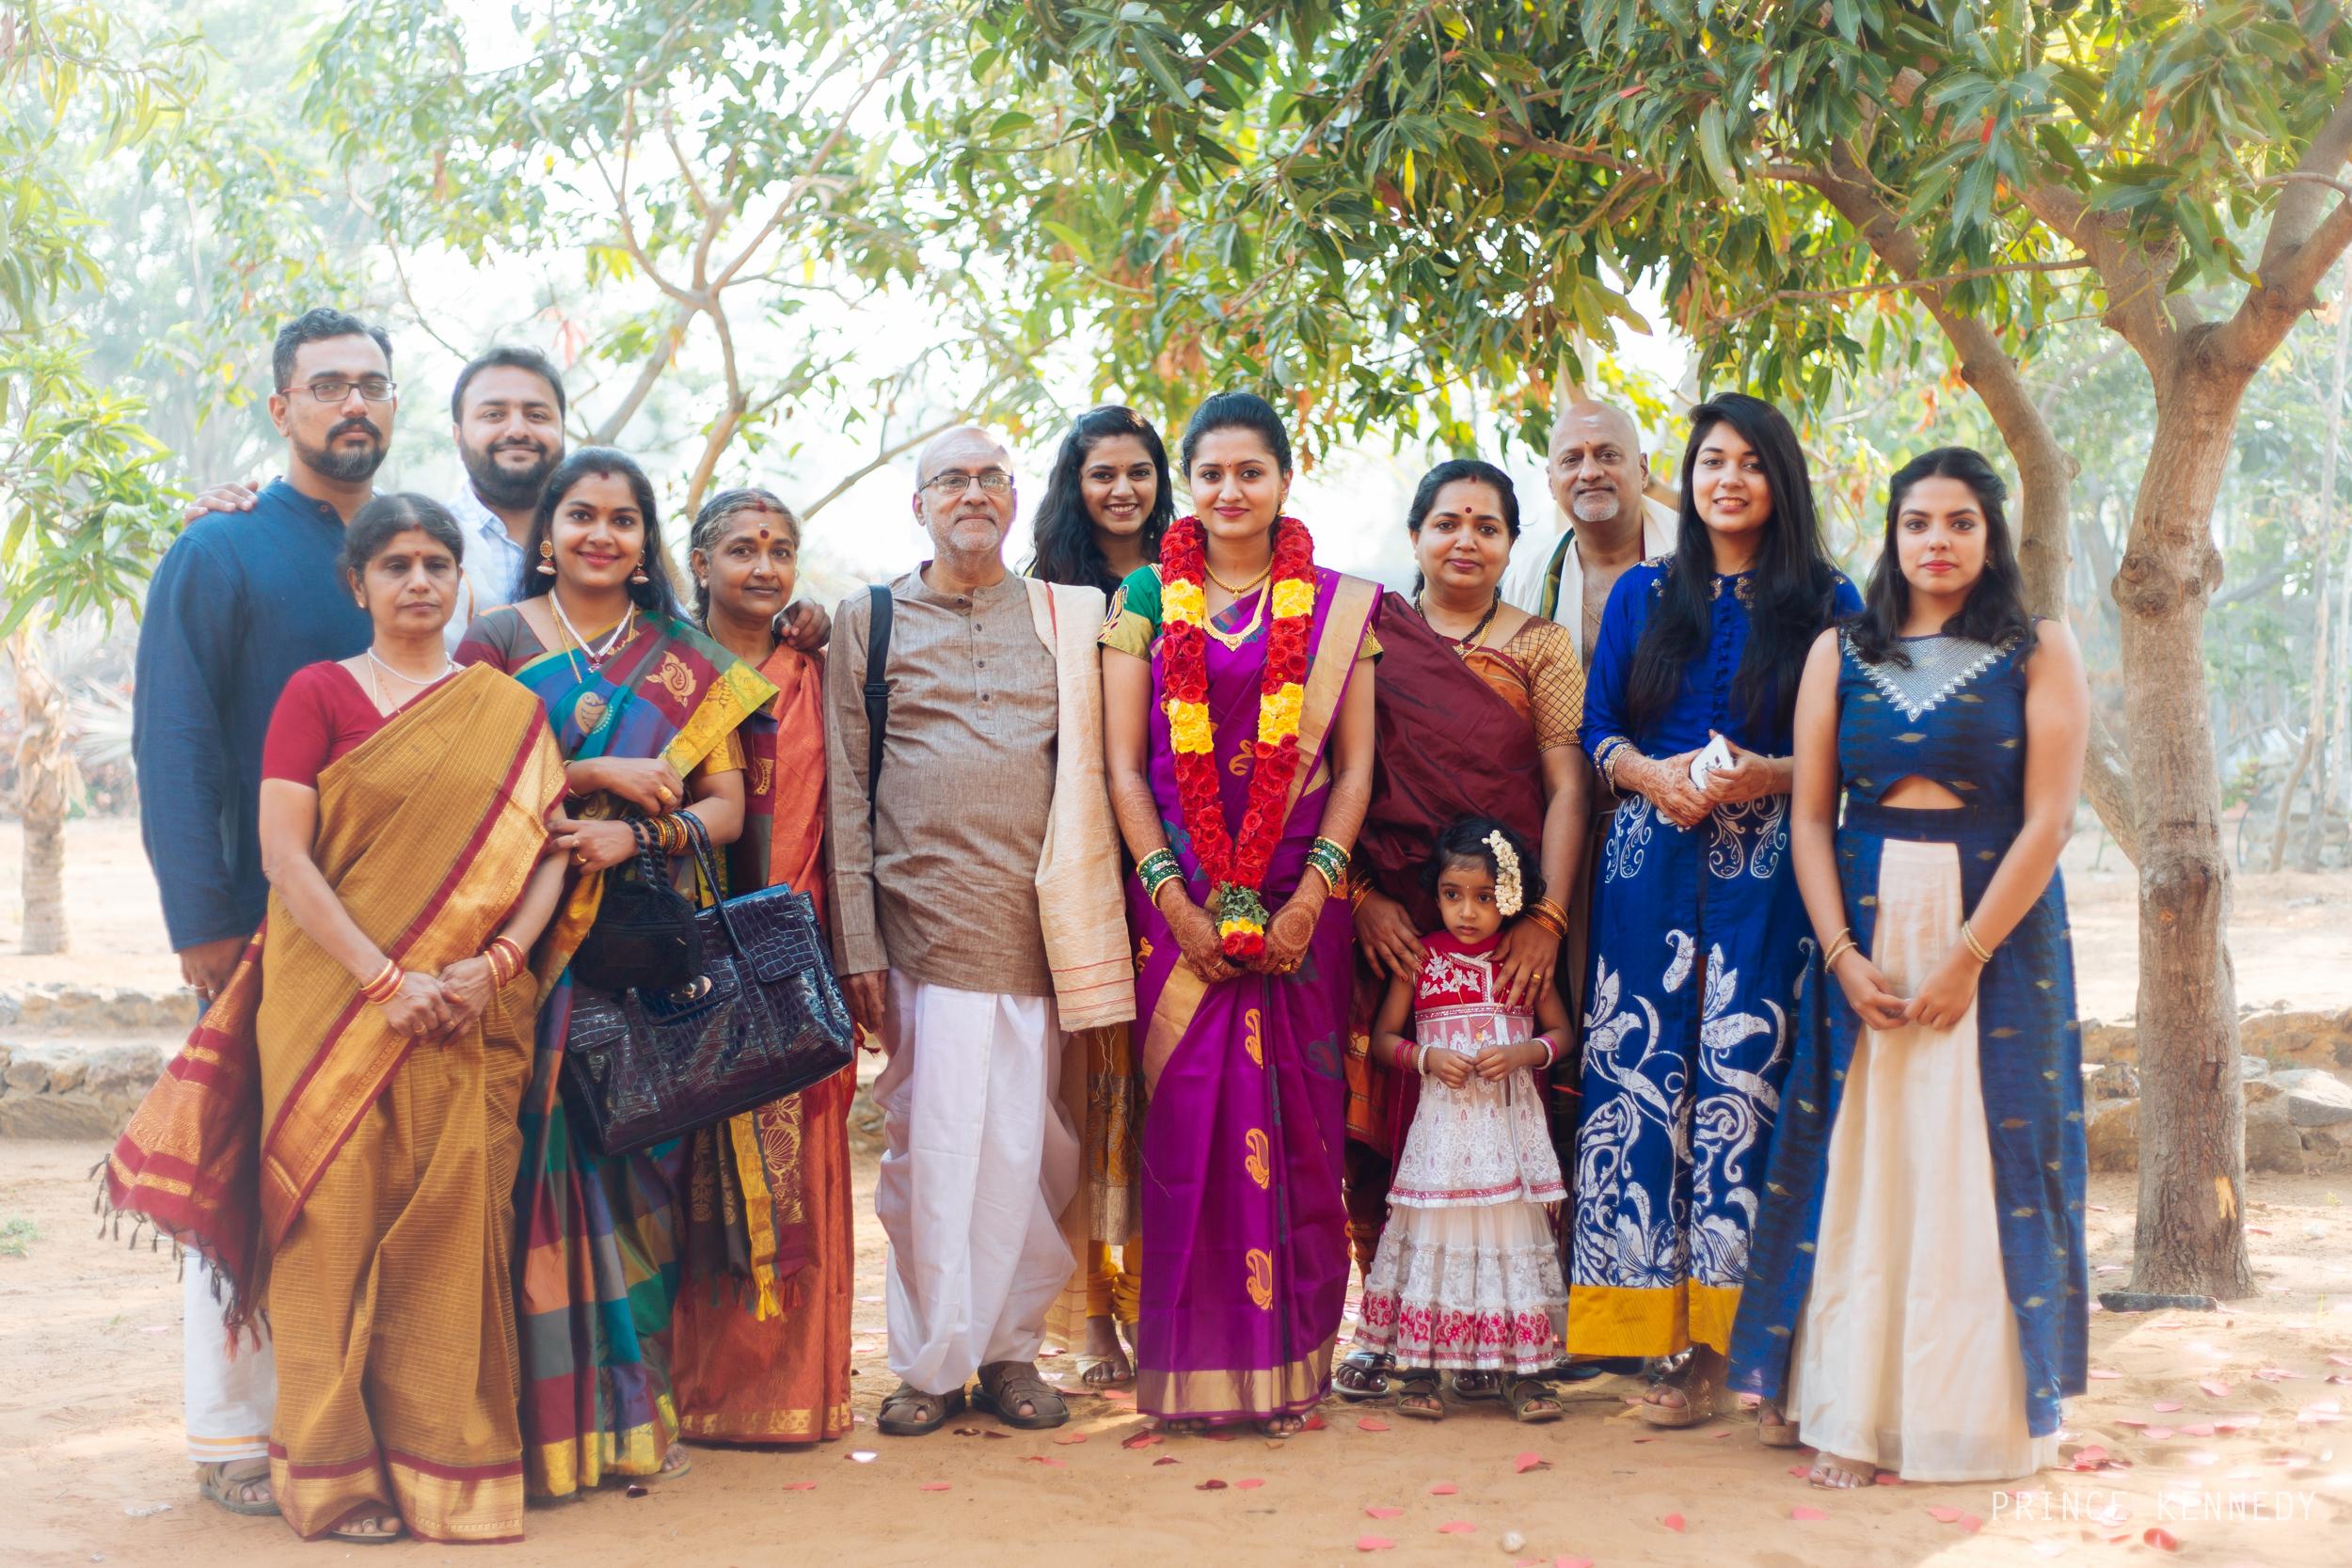 Athmajja-Nithesh-Engagement-Couple-Portrait-Portraiture-Wedding-Couple-Portrait-Chennai-Photographer-Candid-Photography-Destination-Best-Prince-Kennedy-Photography-51.jpg